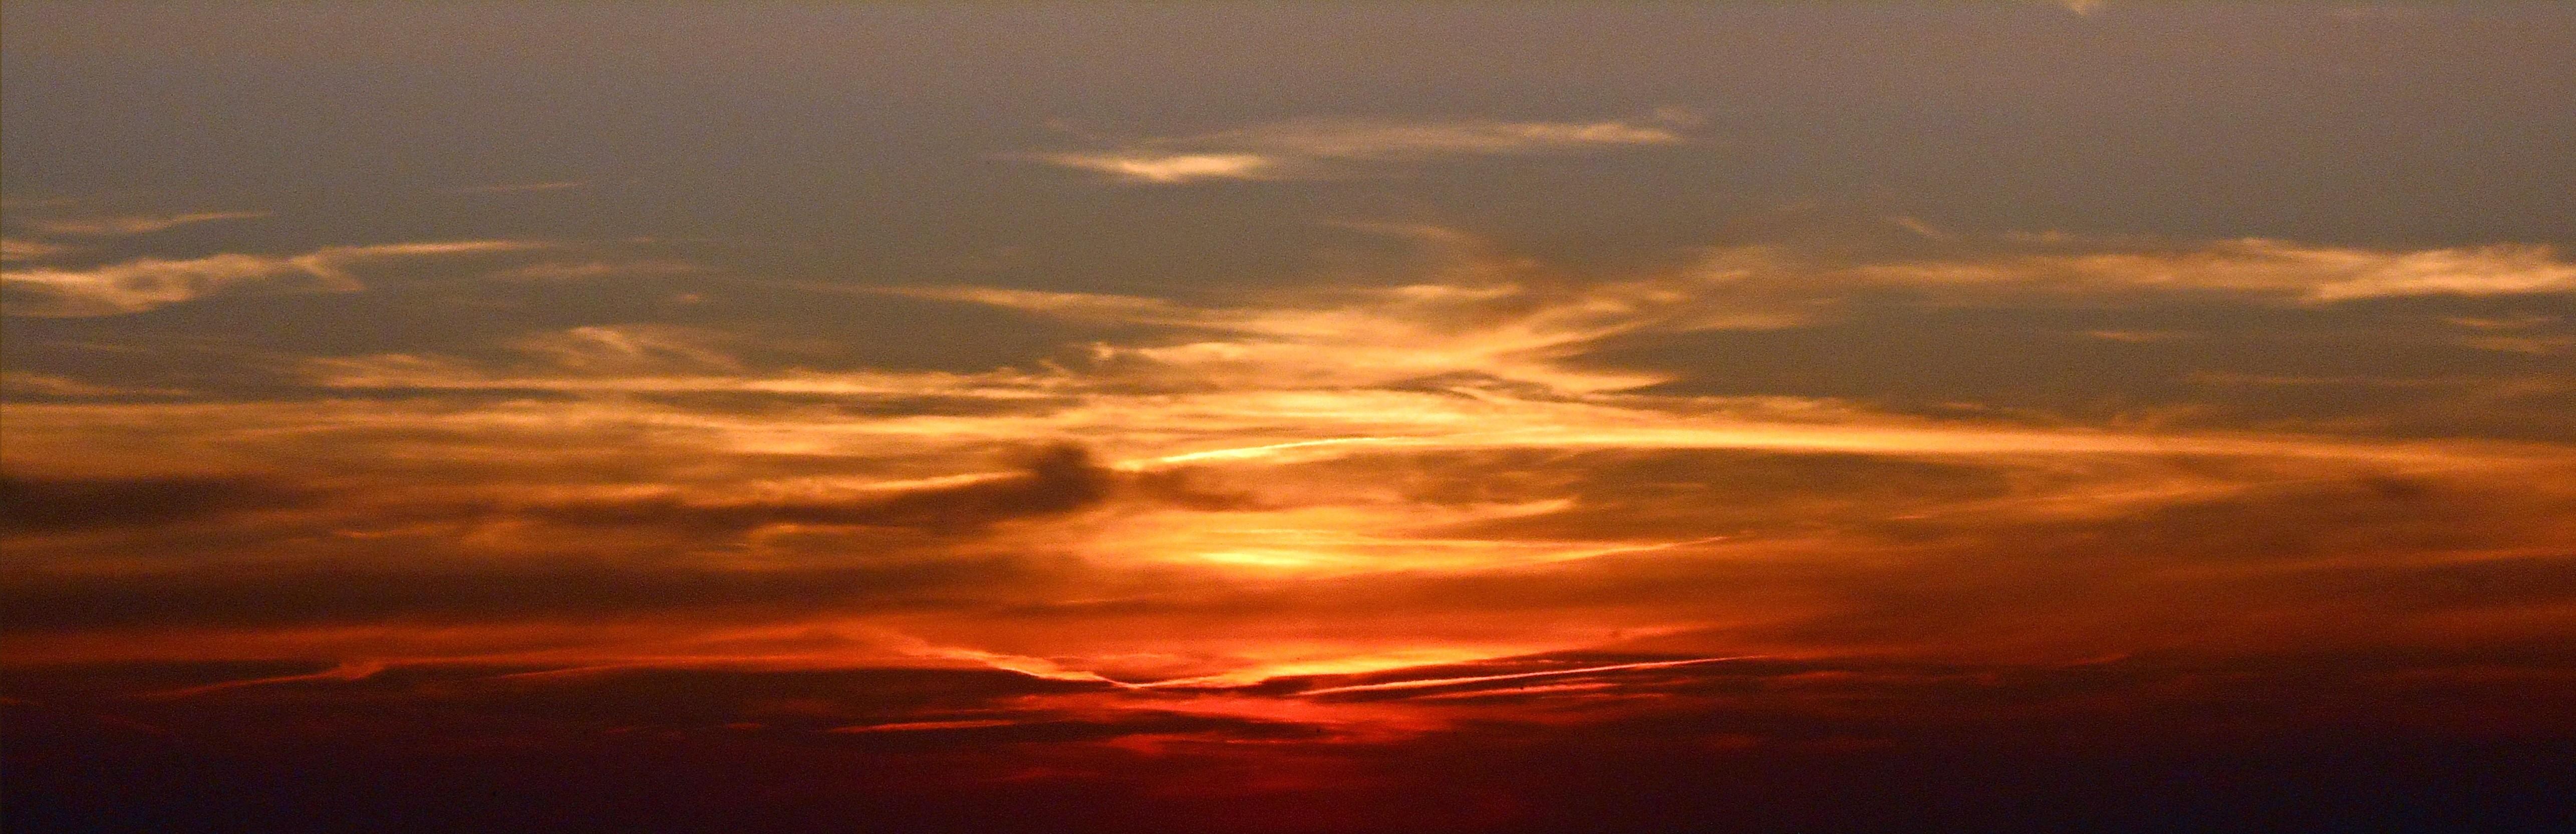 Wakacyjna chmurwa 1.jpg